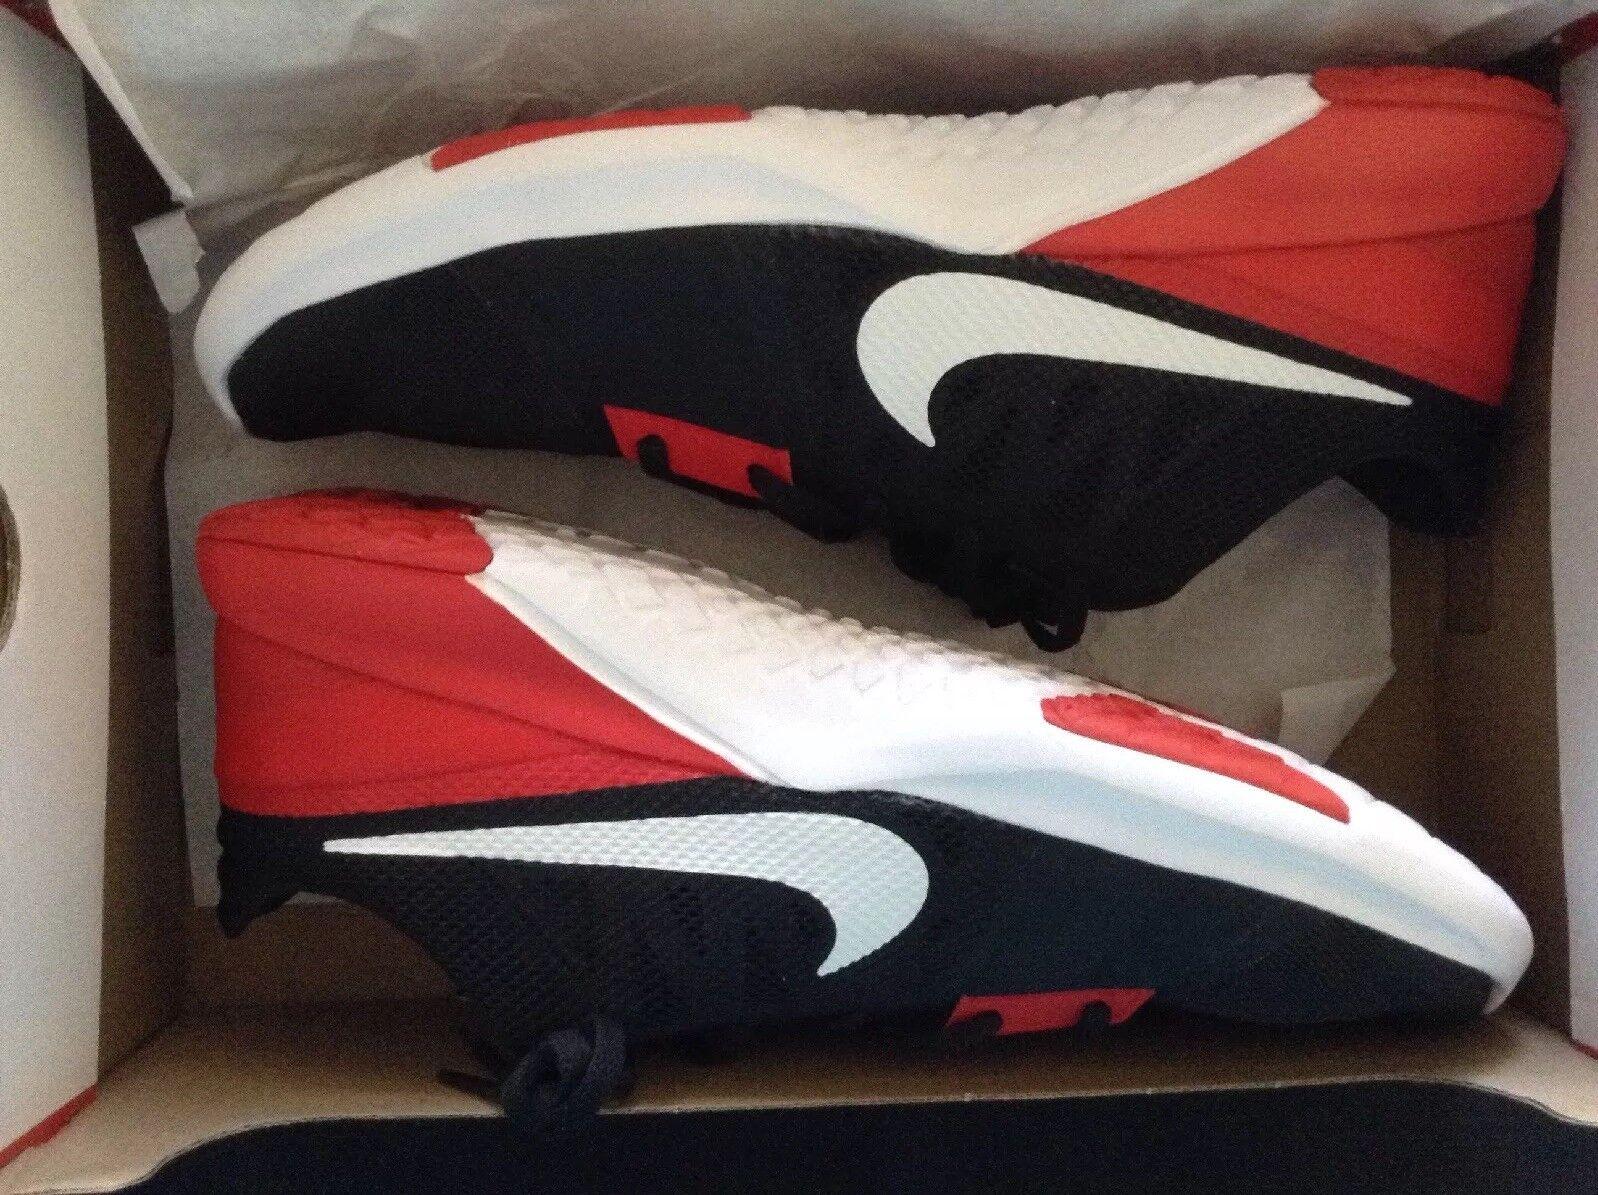 competitive price f0797 afec3 Nike Nike Nike Hombre SM Lite Trainer Shoes talla 11,5 reduccion de precio  el